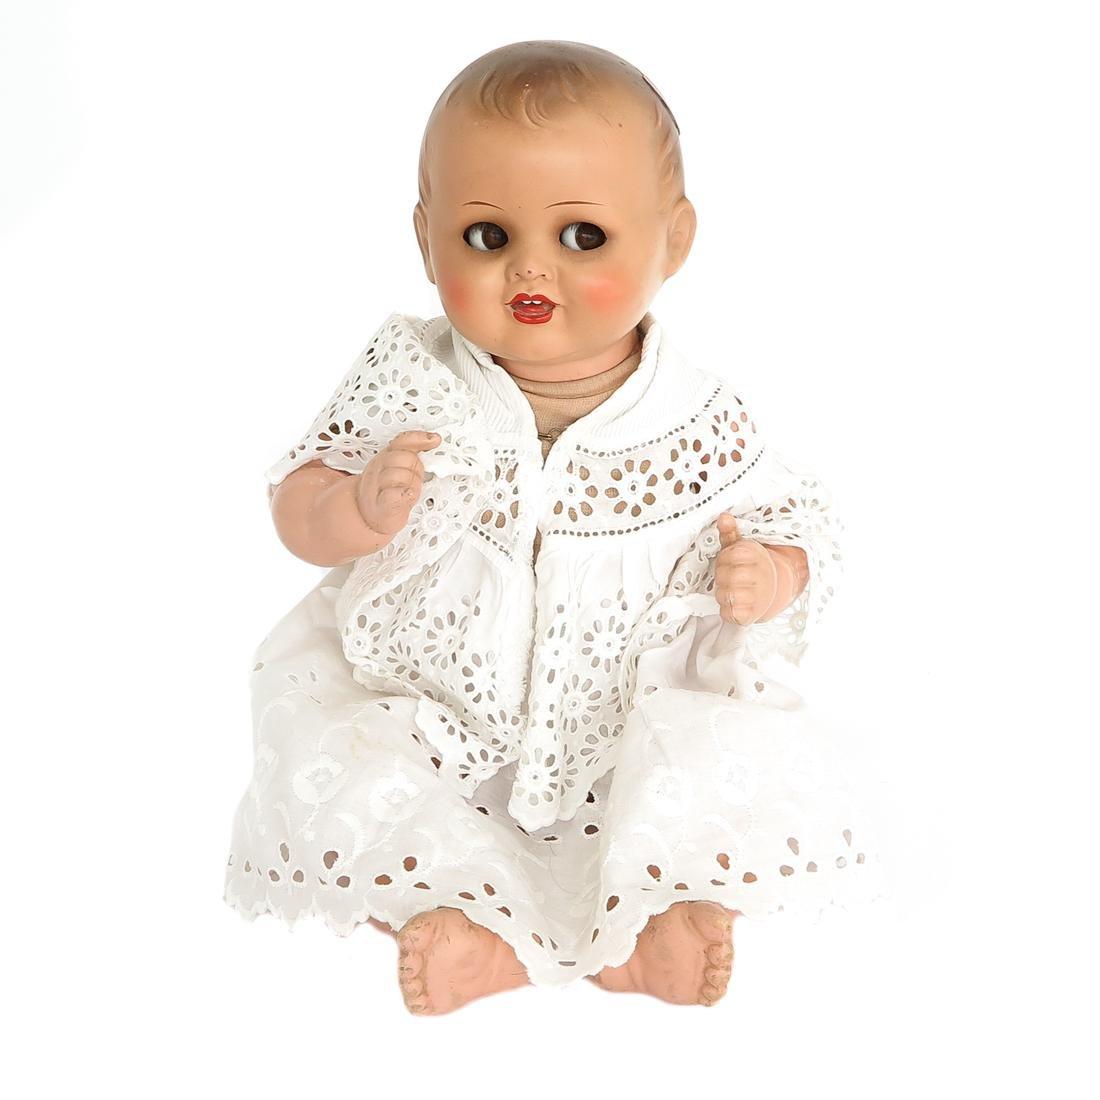 FS & Co Vintage Googly Eye Doll